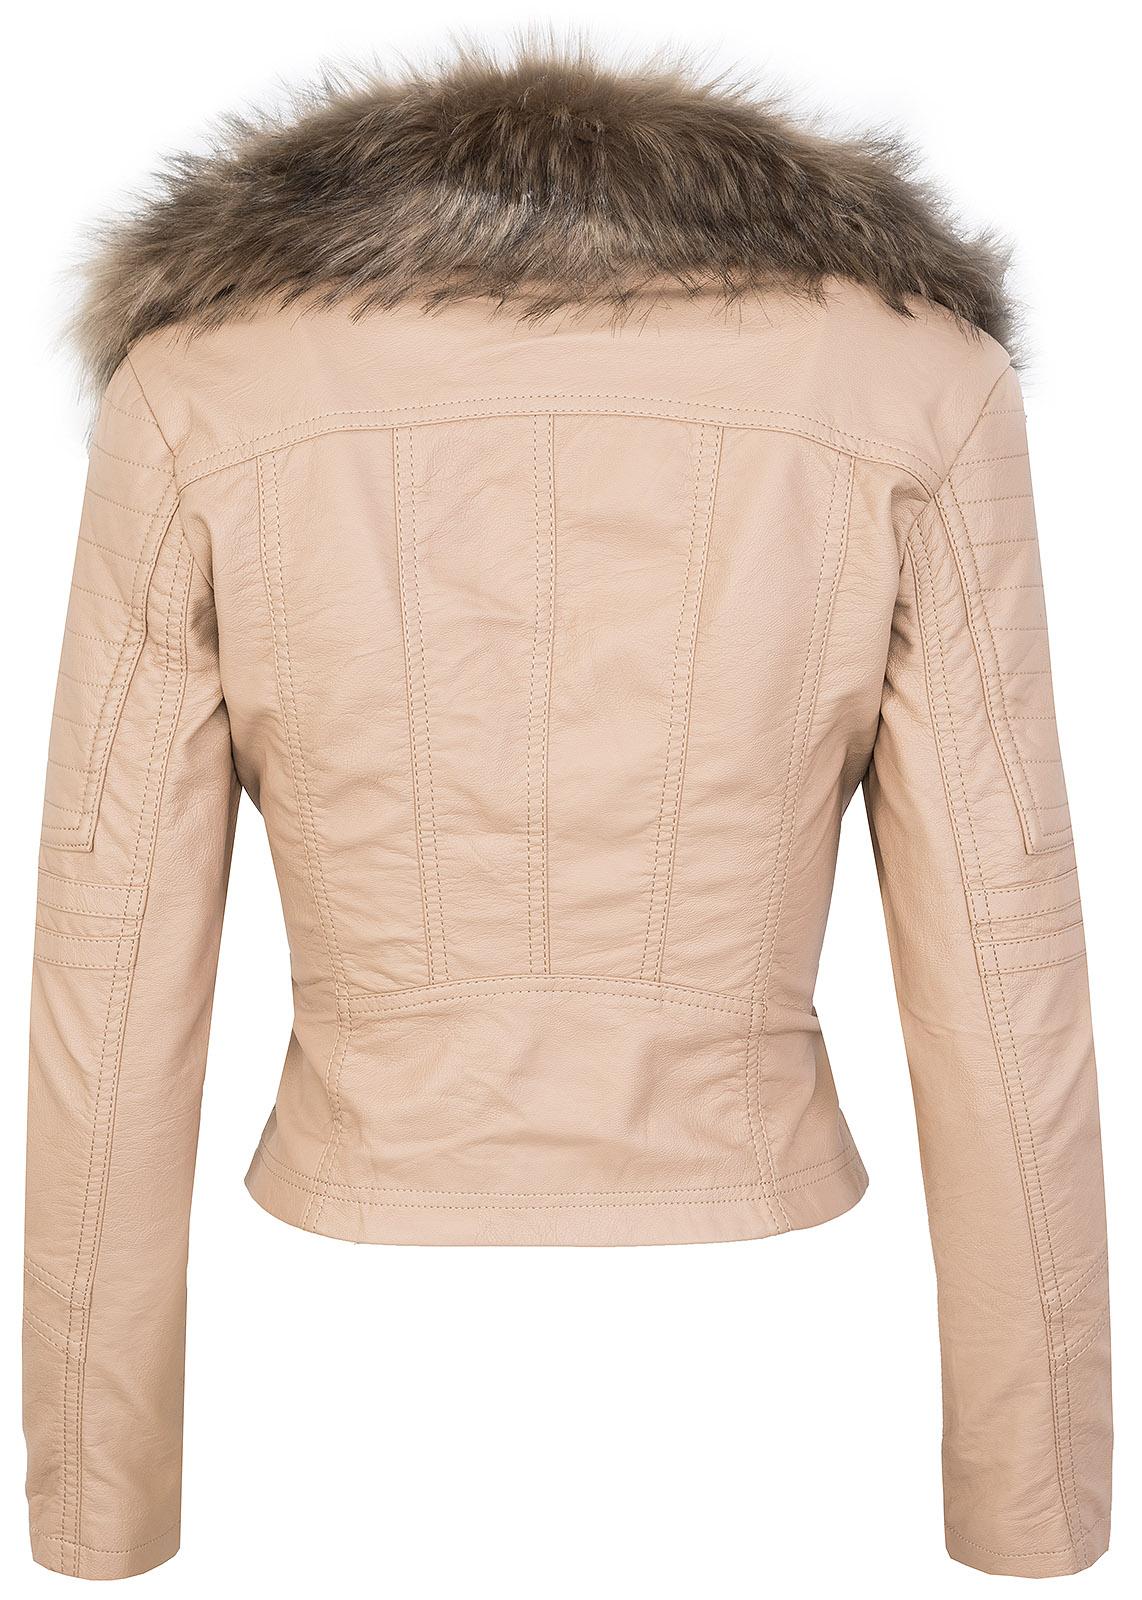 Designer Damen Winter Jacke elegant Kunstfellkragen Übergangsjacke S-XL D-362